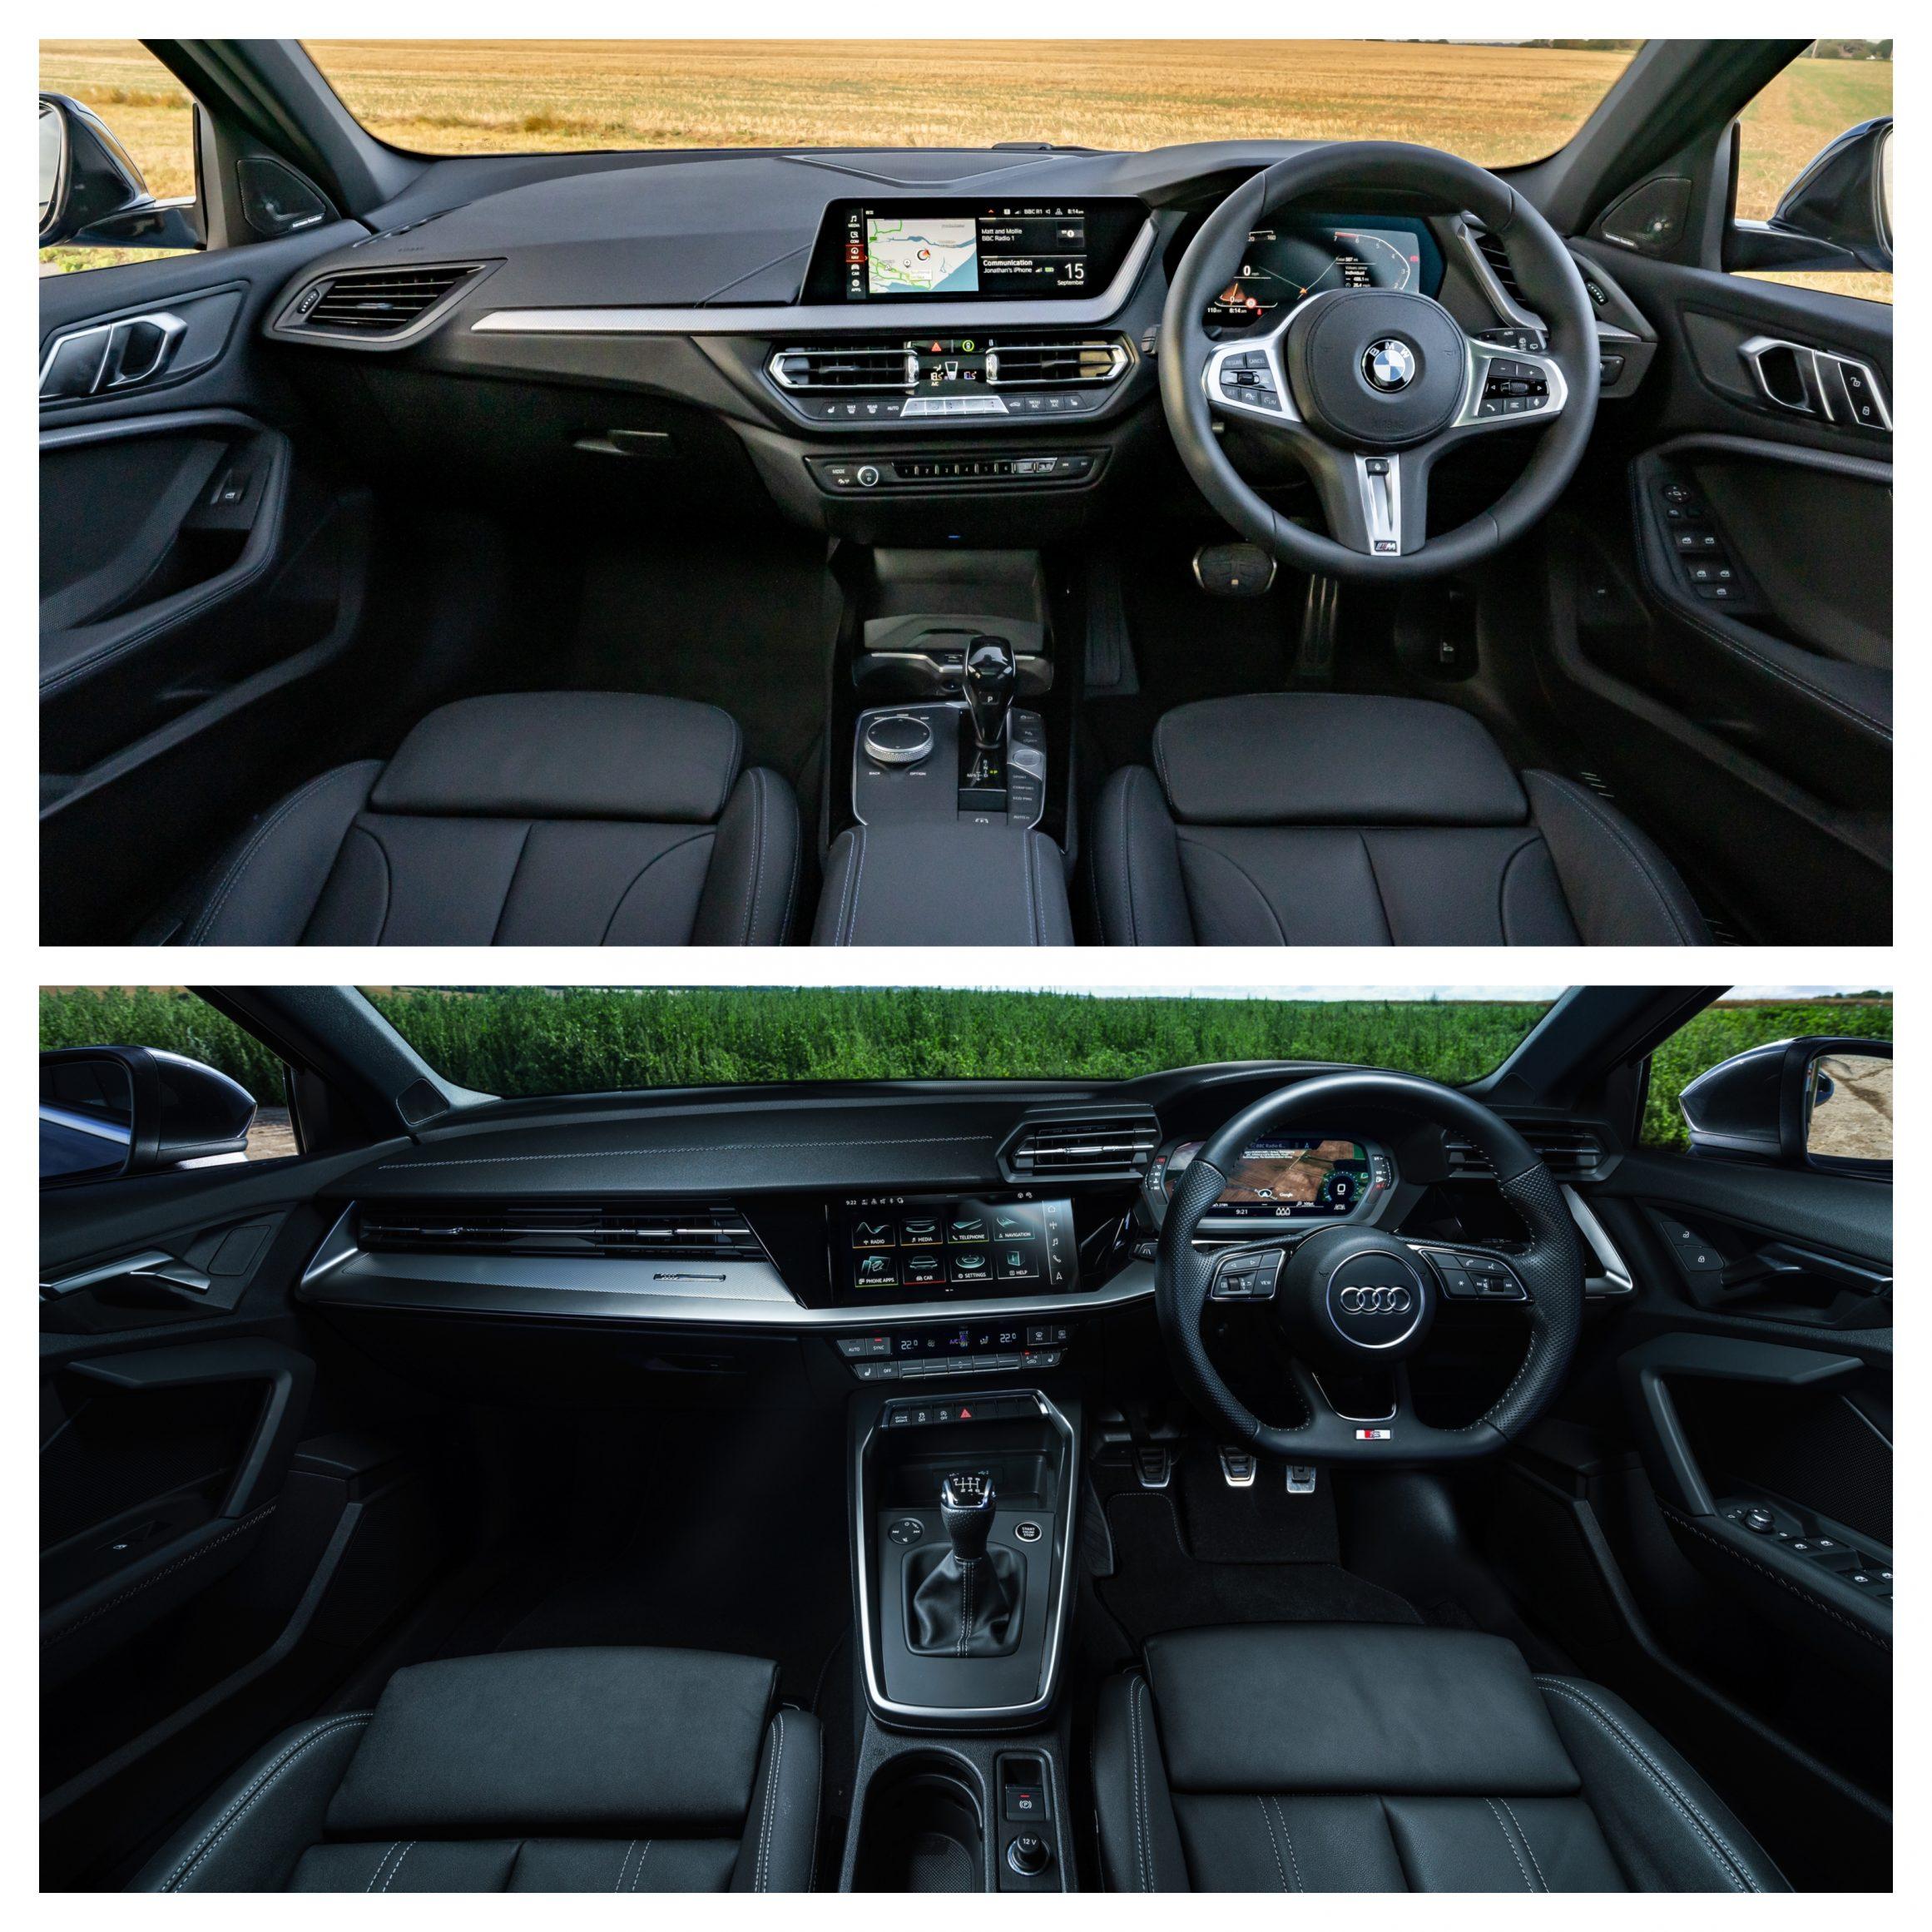 BMW 1 Series Vs Audi A3 - interior design